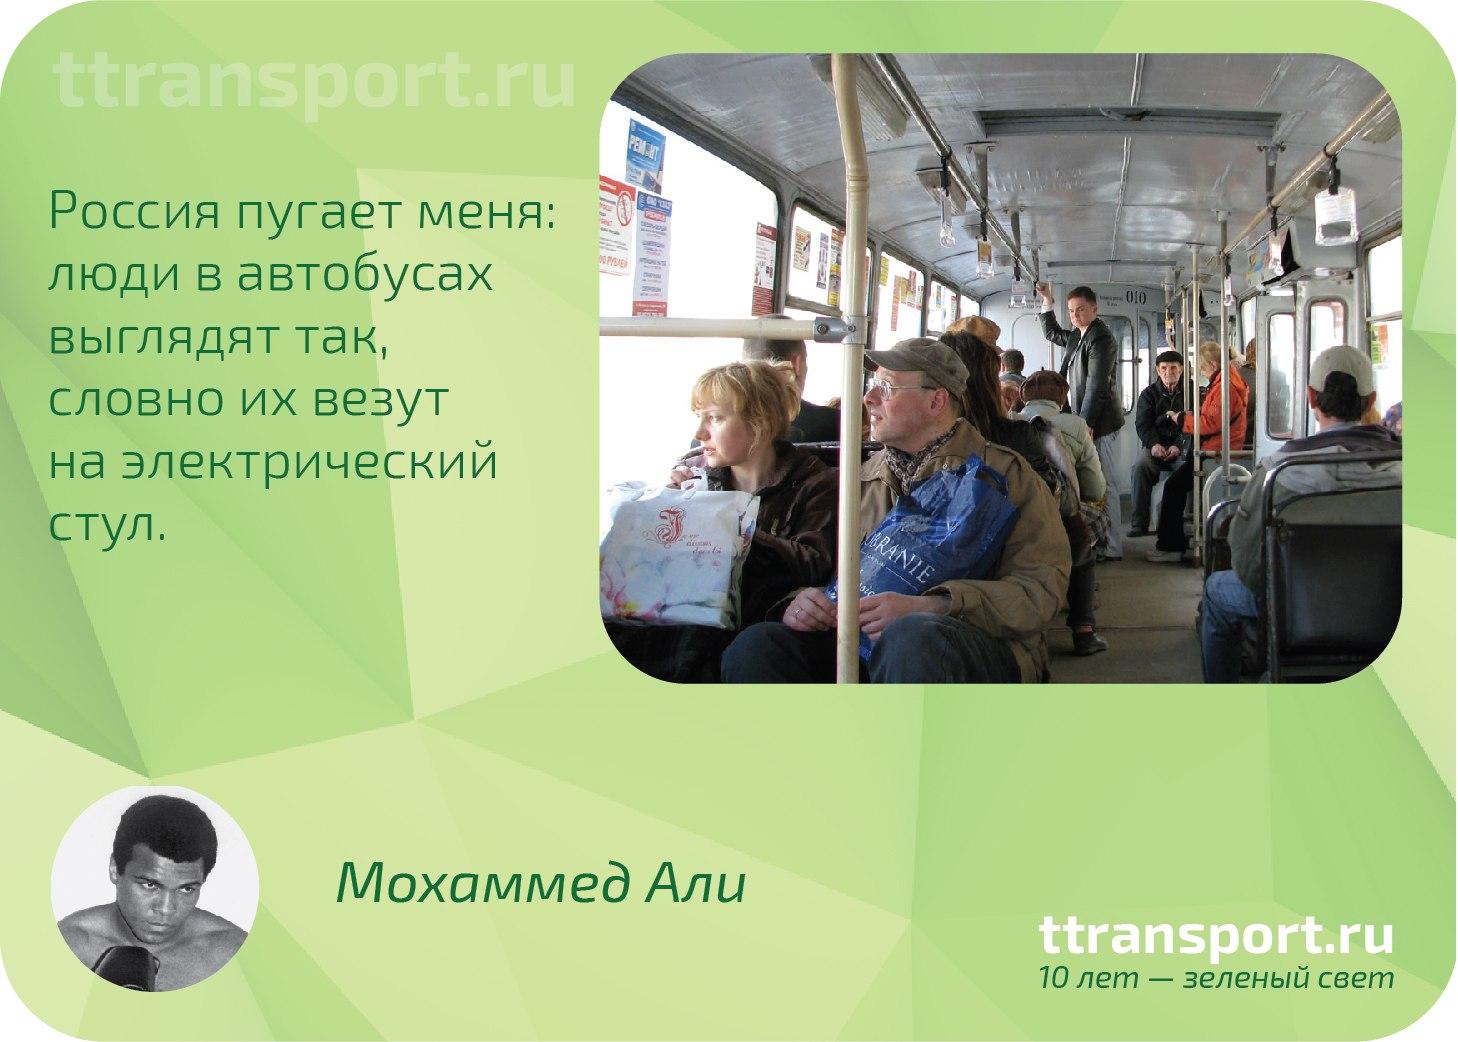 Мохаммед Али про транспорт